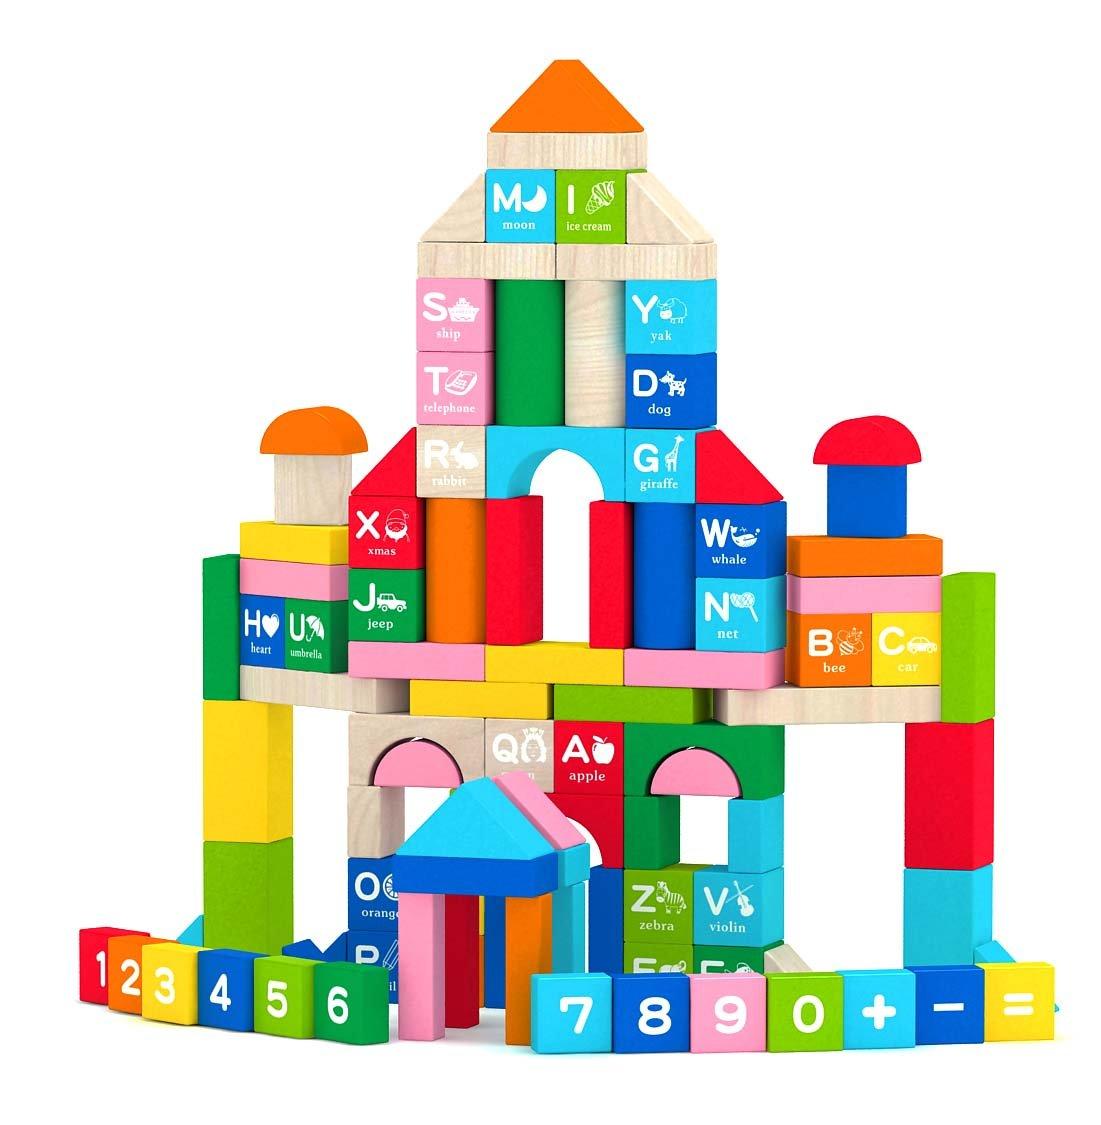 JOYIN 100ピースWooden Stacking Blocks Shape Color並べ替えアルファベット番号建物ブロック教育玩具で設定8色(ストレージバケット付属)   B076ZSQPT8